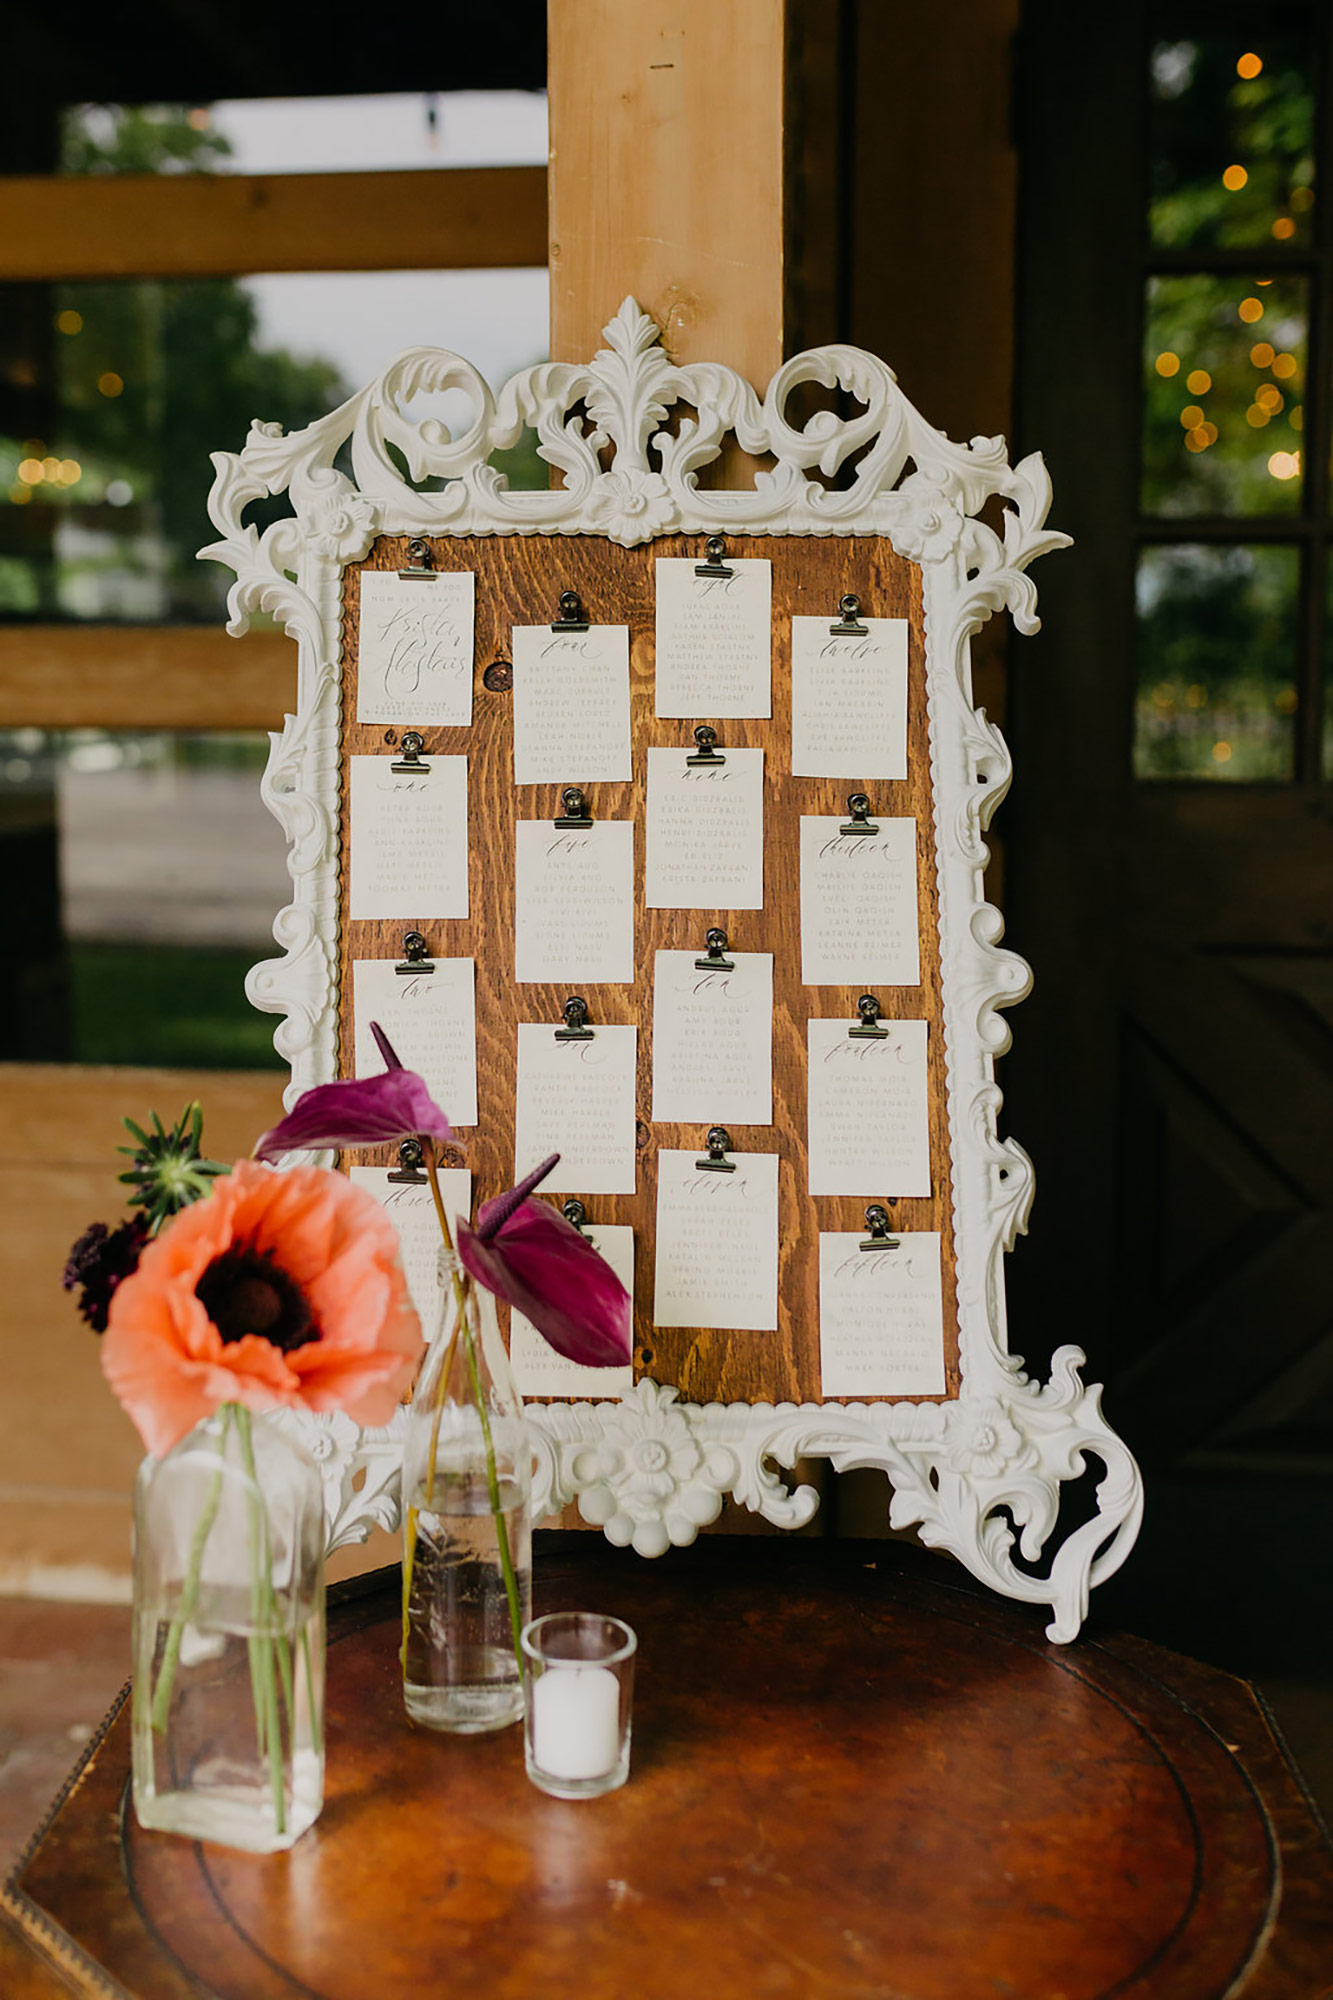 Kurtz-Orchards-Wedding-Niagara-wedding-Vineyard-Bride-Photography-by-Kayla-Rocca-029.JPG